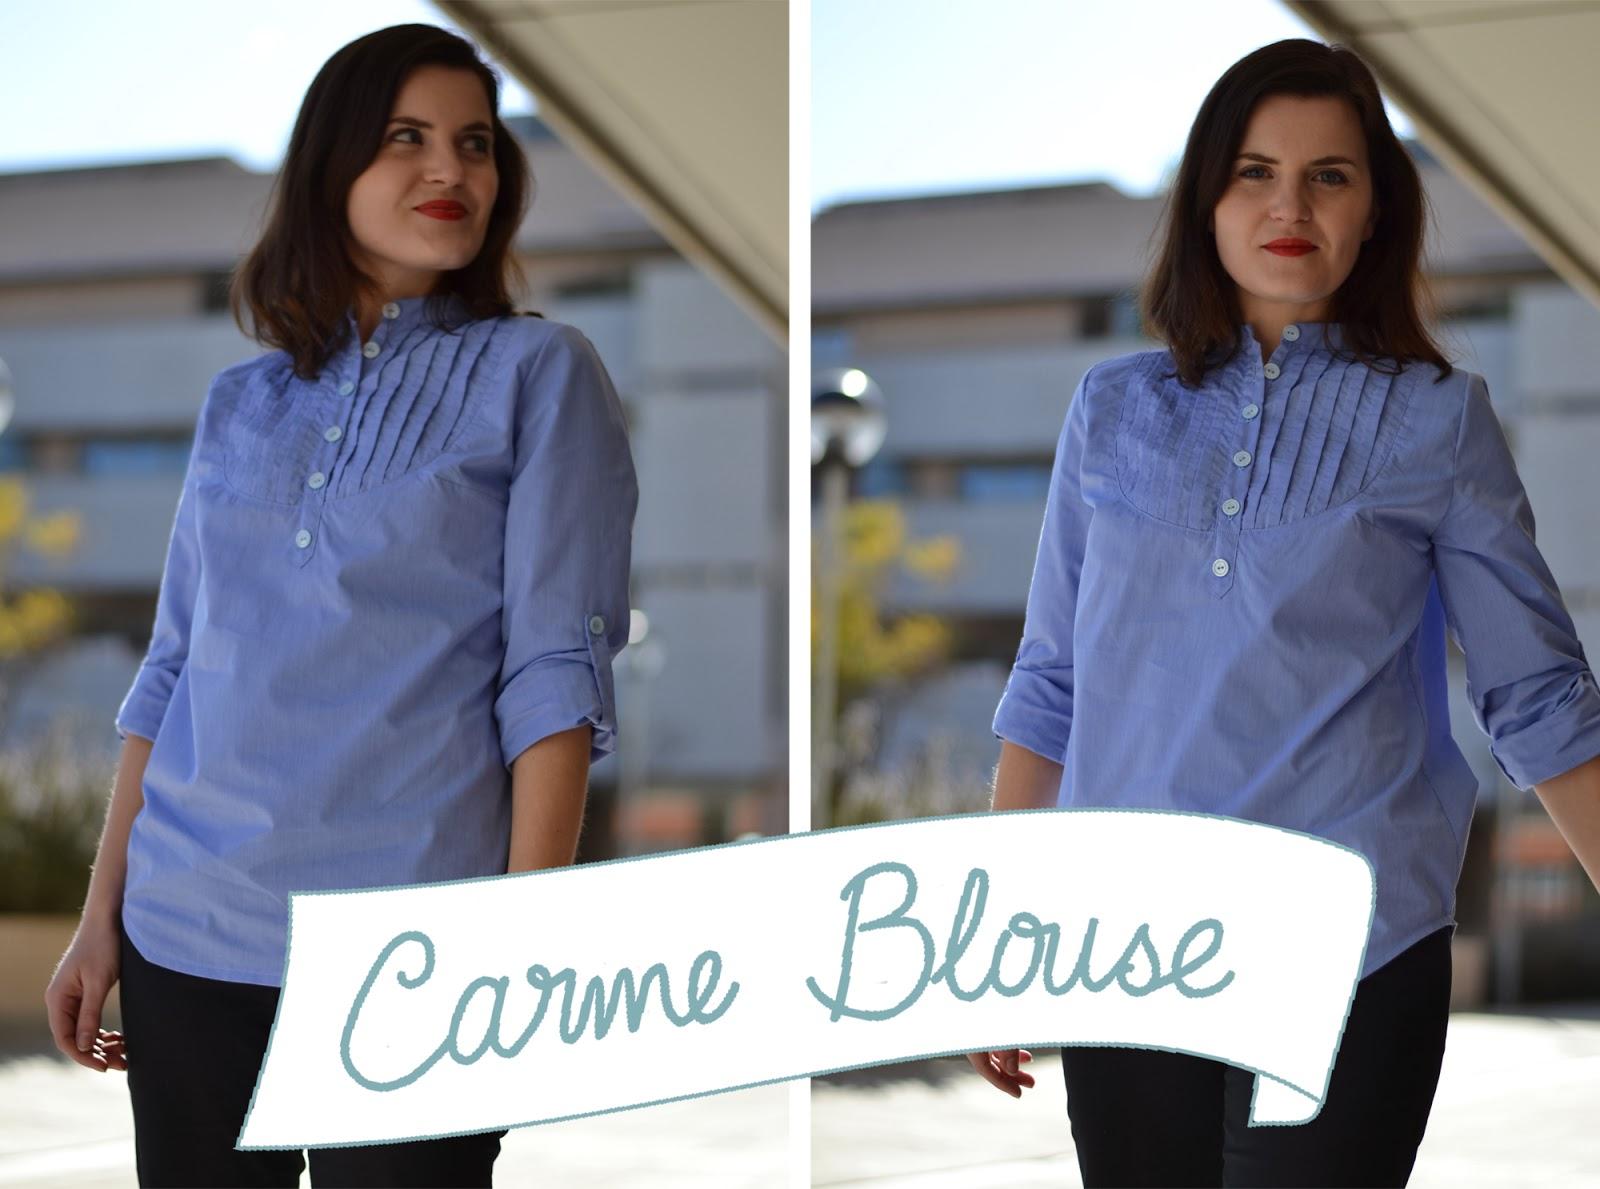 blusa Carme, patron blusa, canesu, lorzas, trabilla manga, solapa abotonada